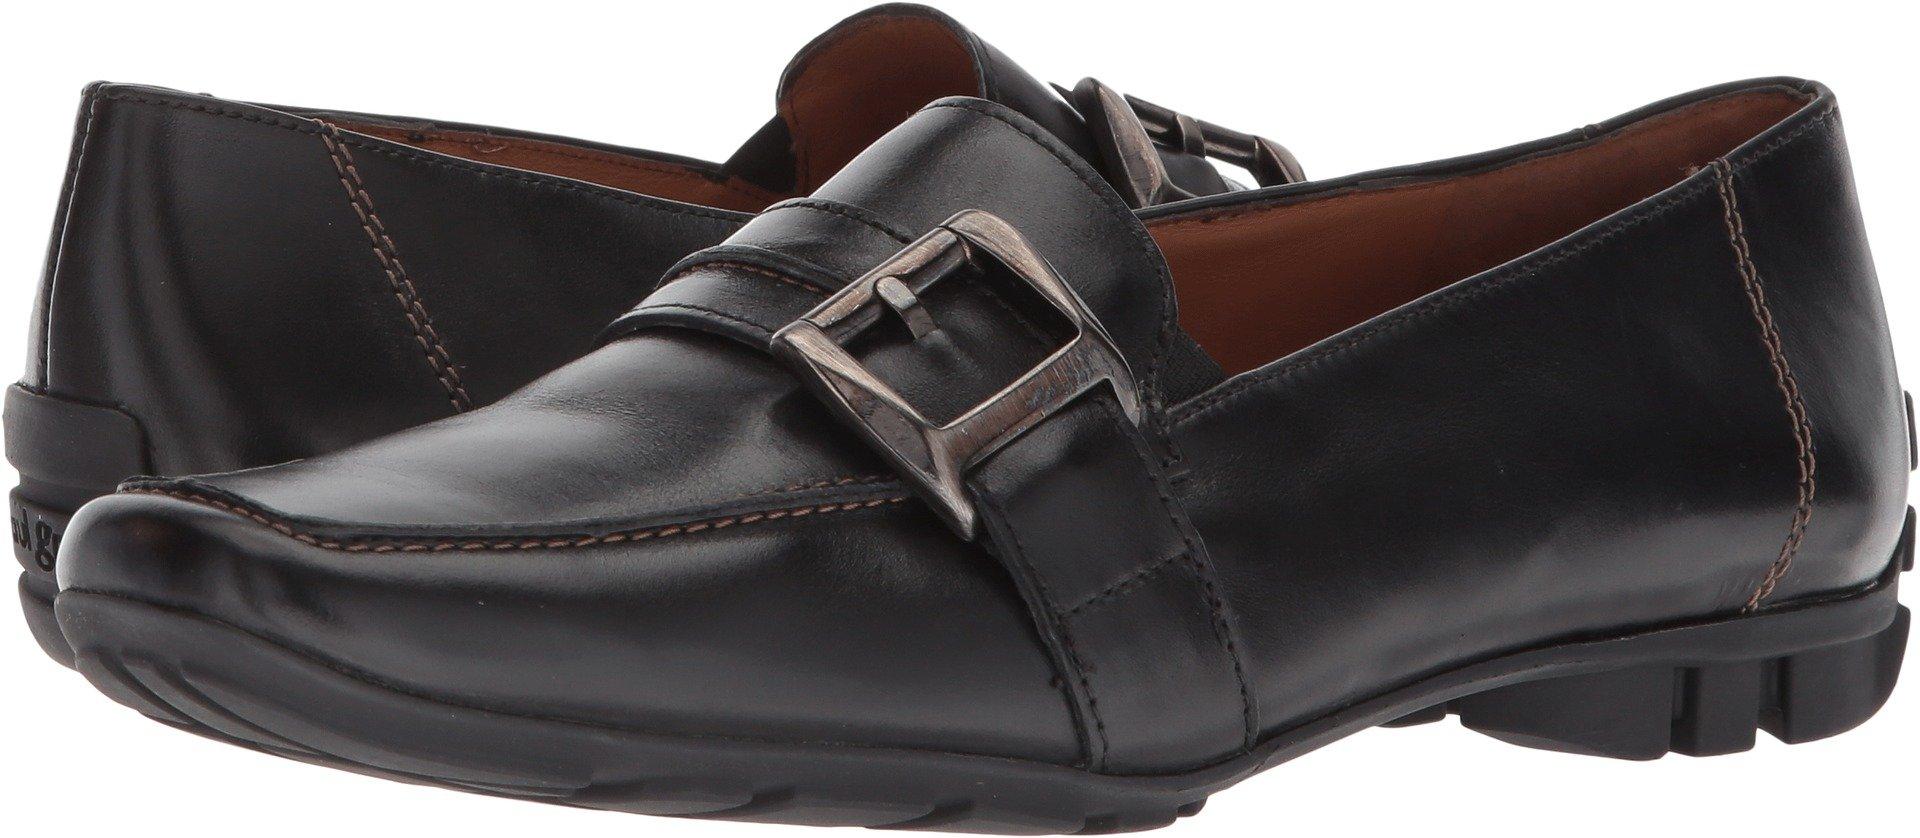 Paul Green Women's Neutron Loafer Black Leather 9.5 M US